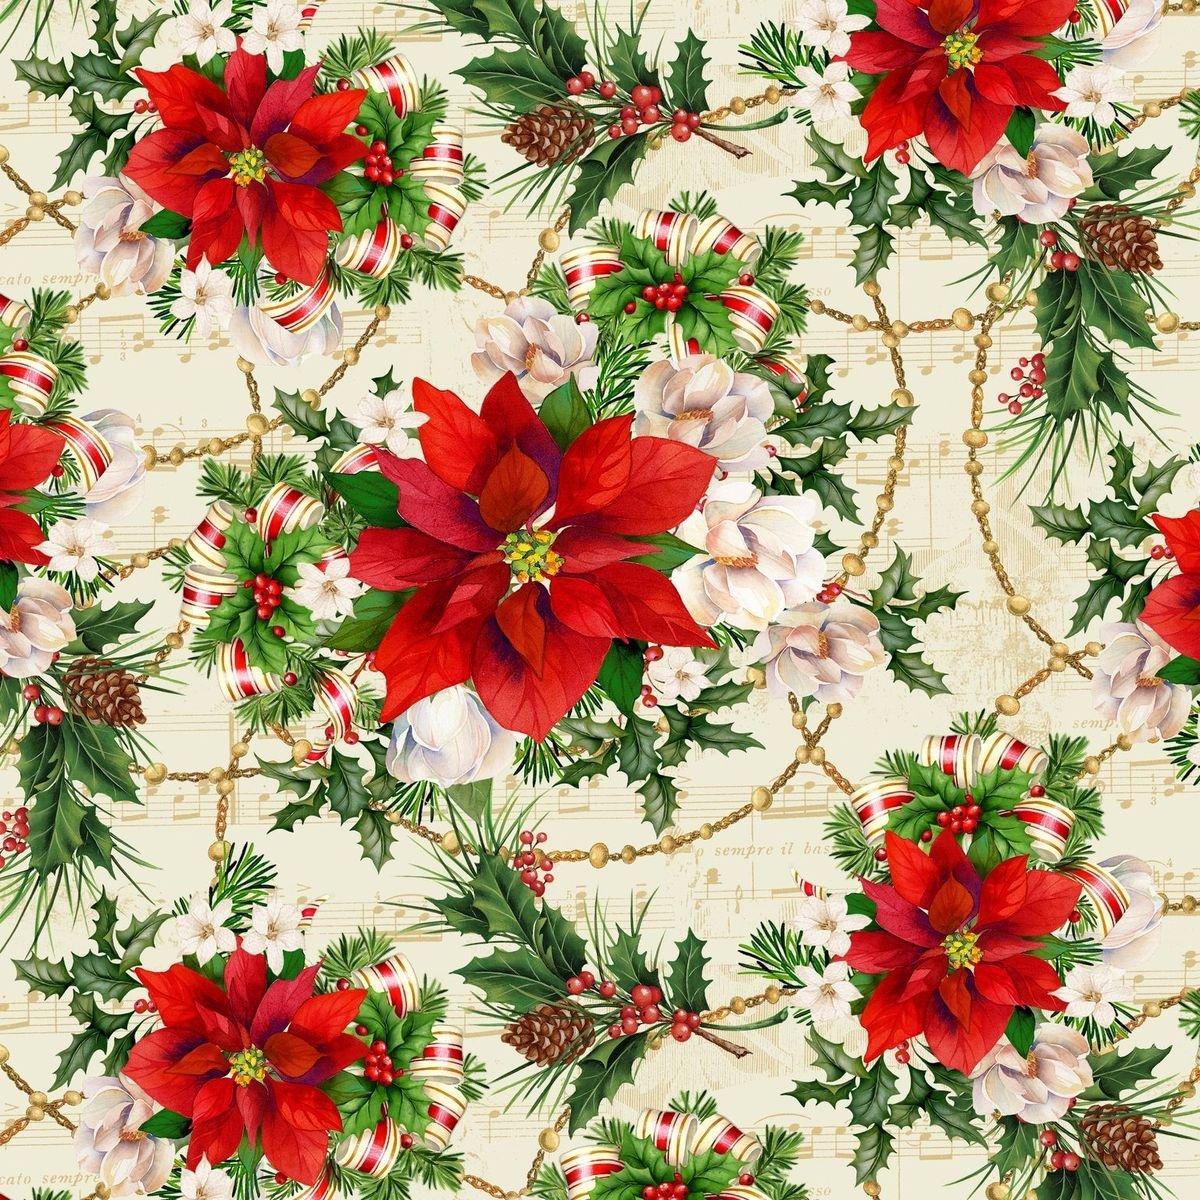 HG-Christmas Legend 9518-44 Cream - Poinsettia Print